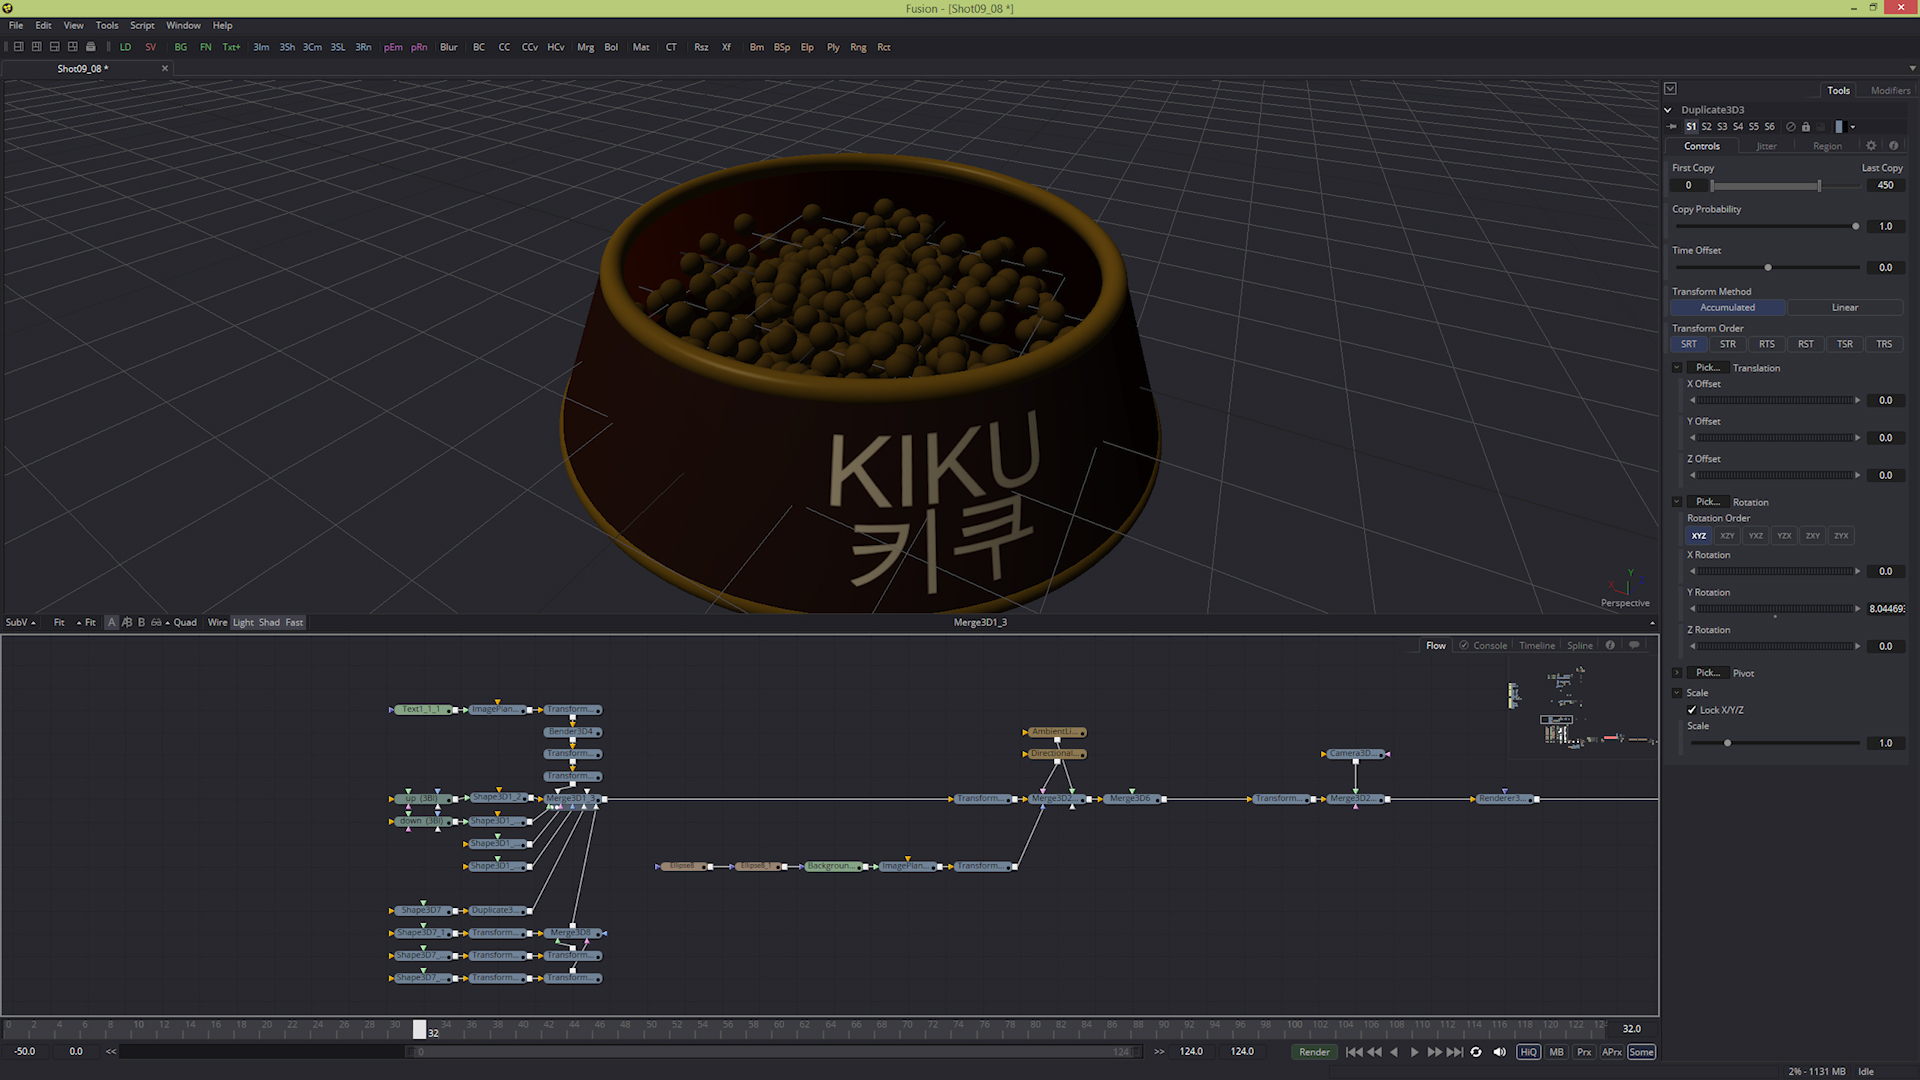 Kiku_Breakdown_11.jpg